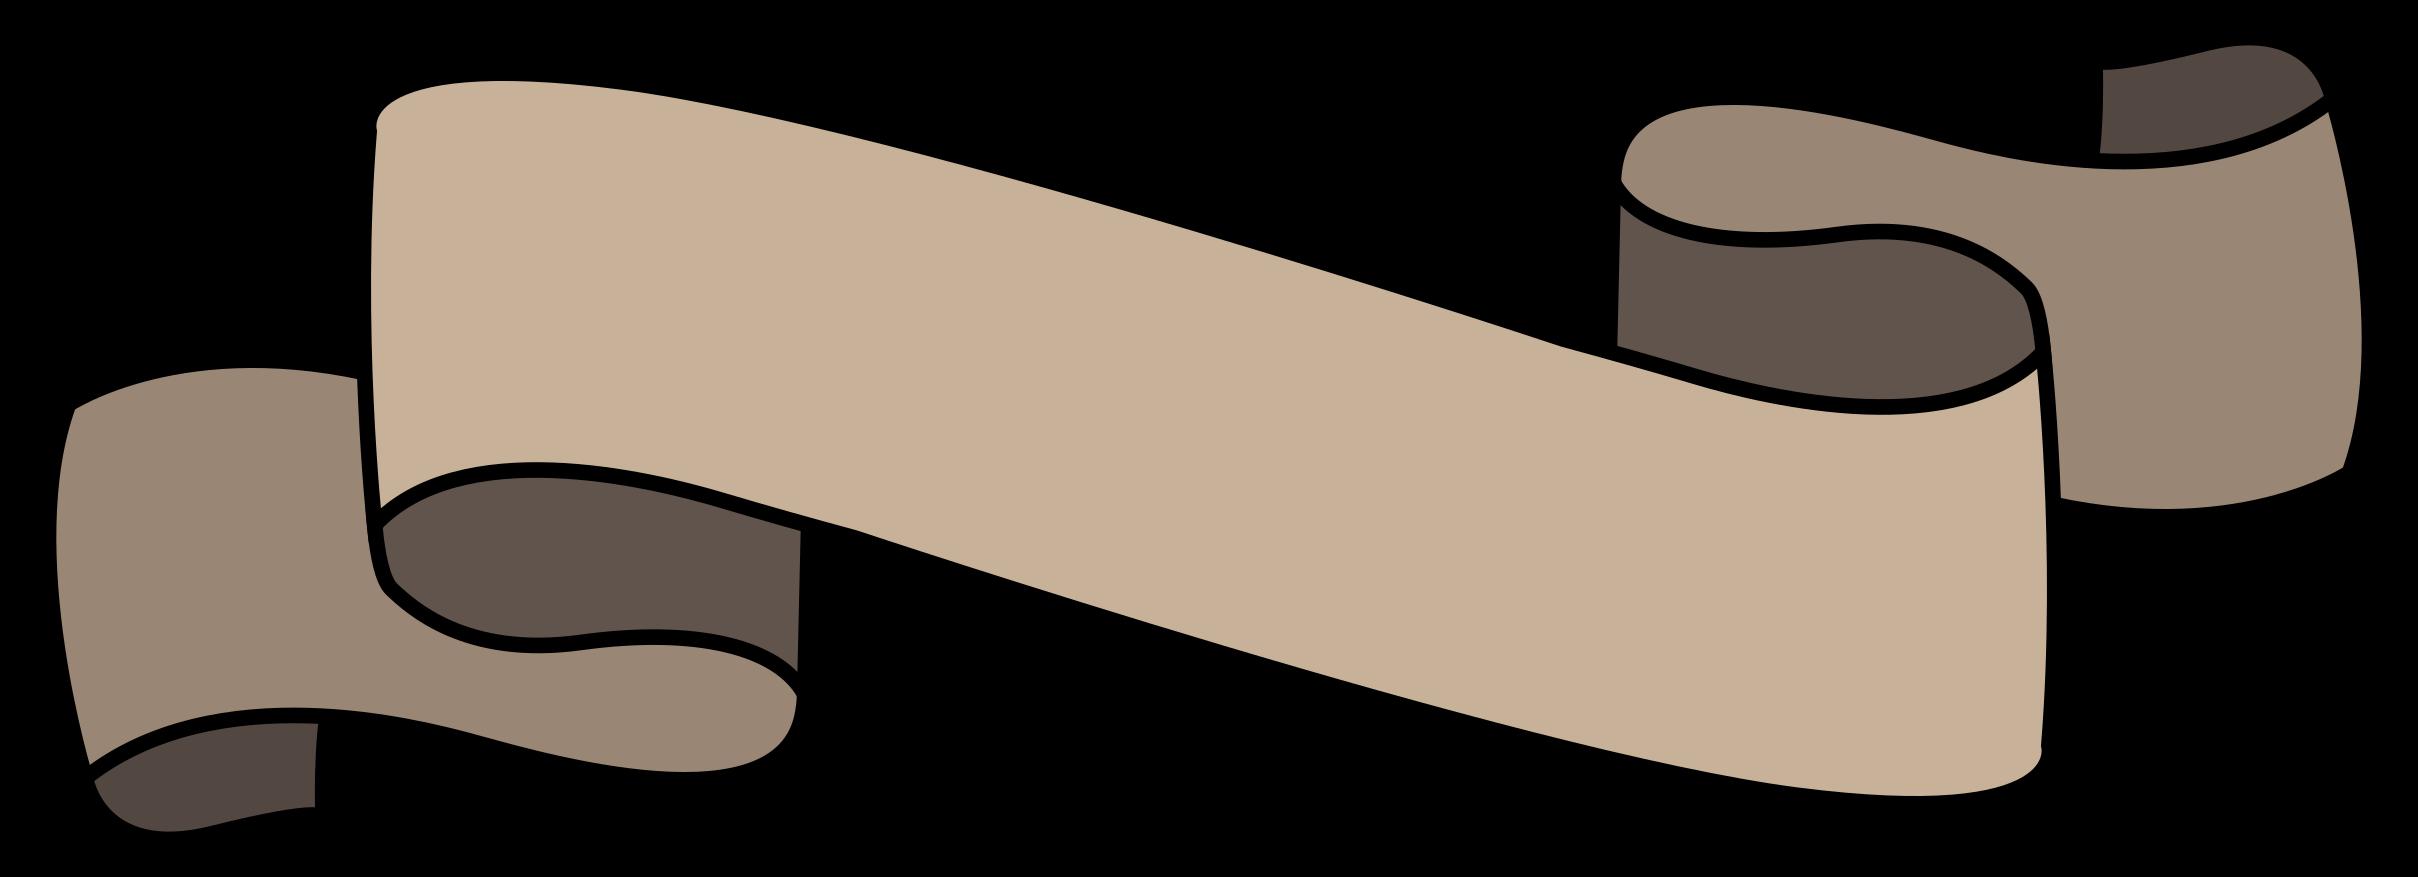 Outline ribbon png